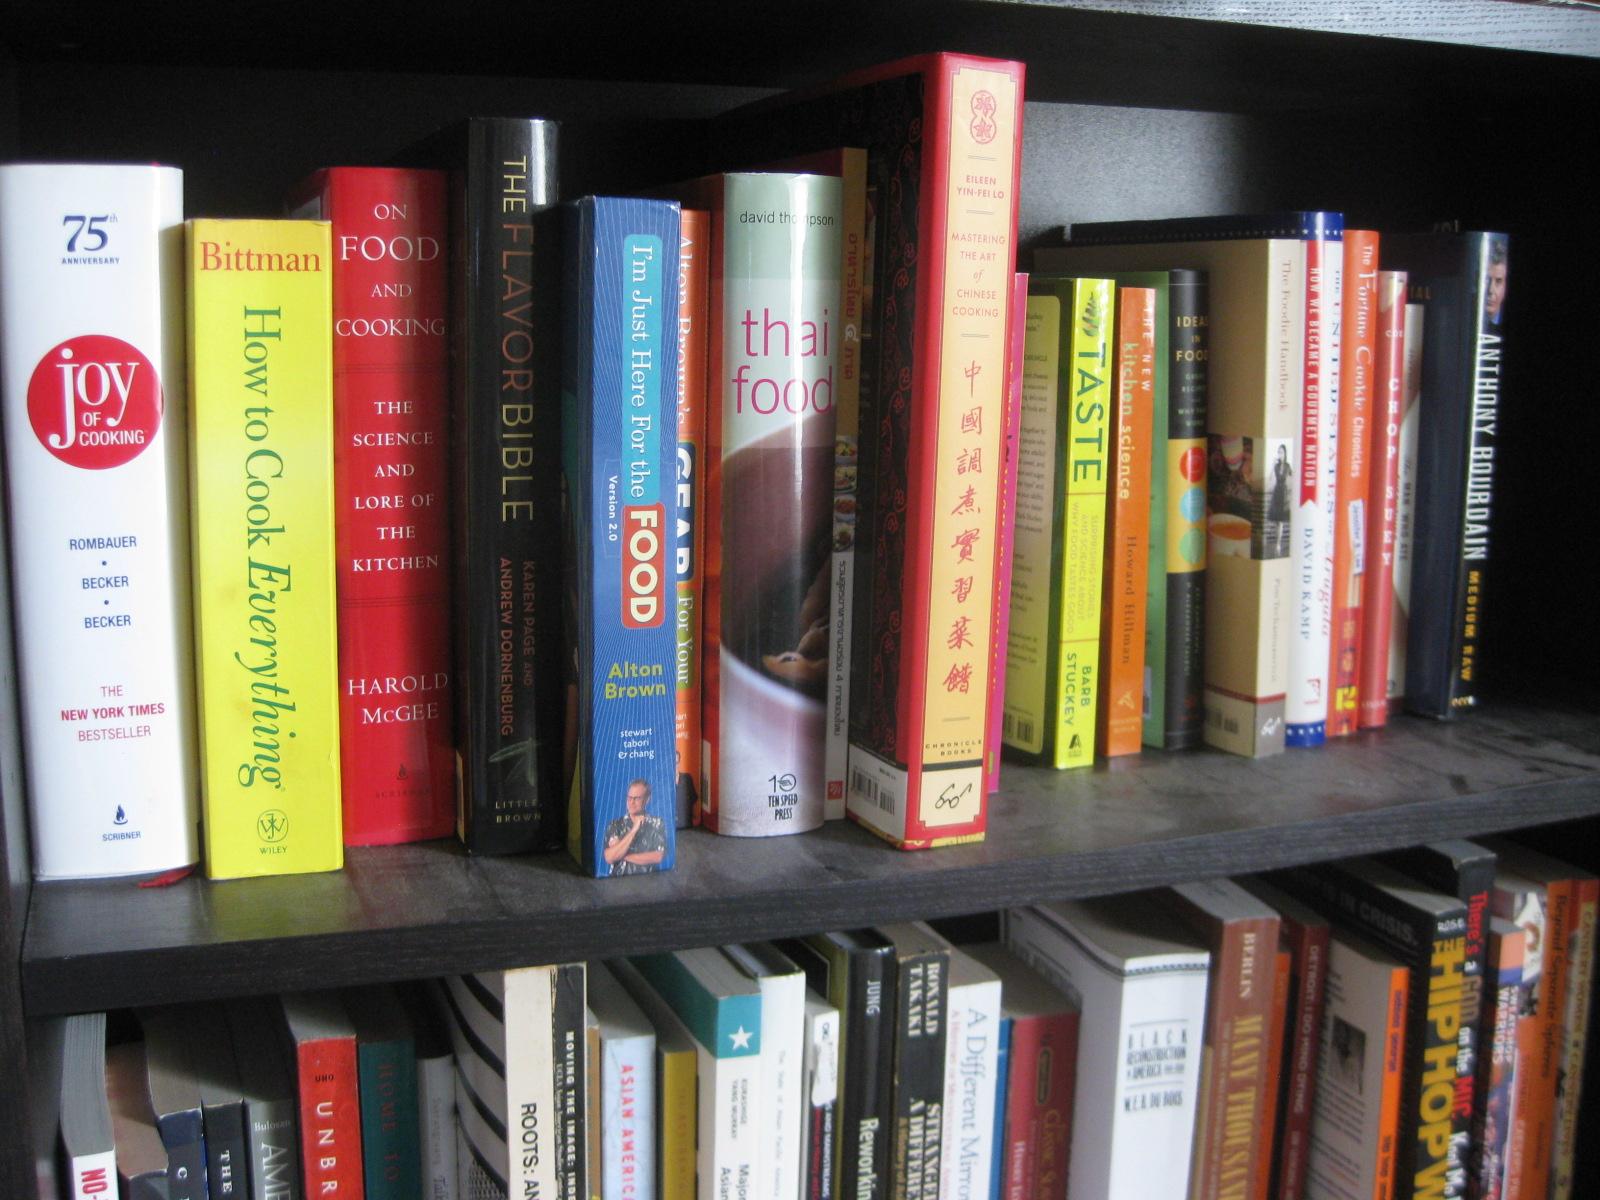 Food bookshelf